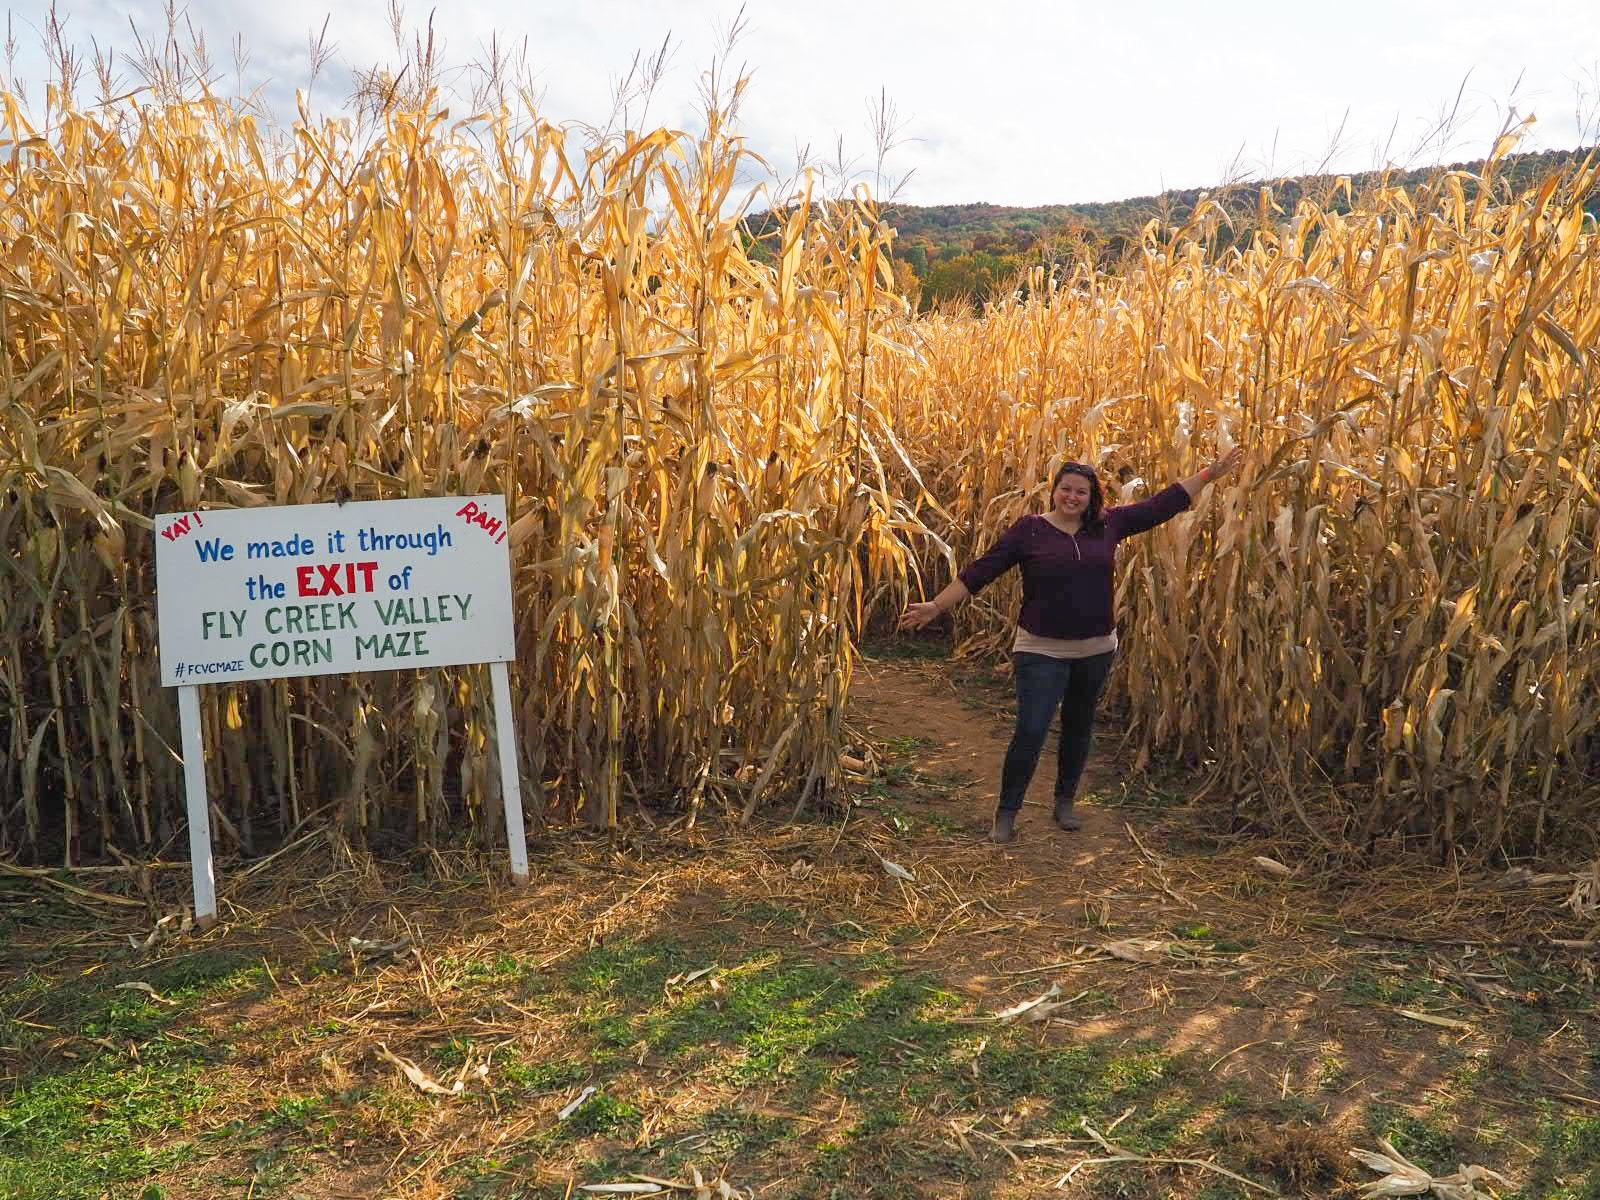 Fly Creek Valley Corn Maze Exit